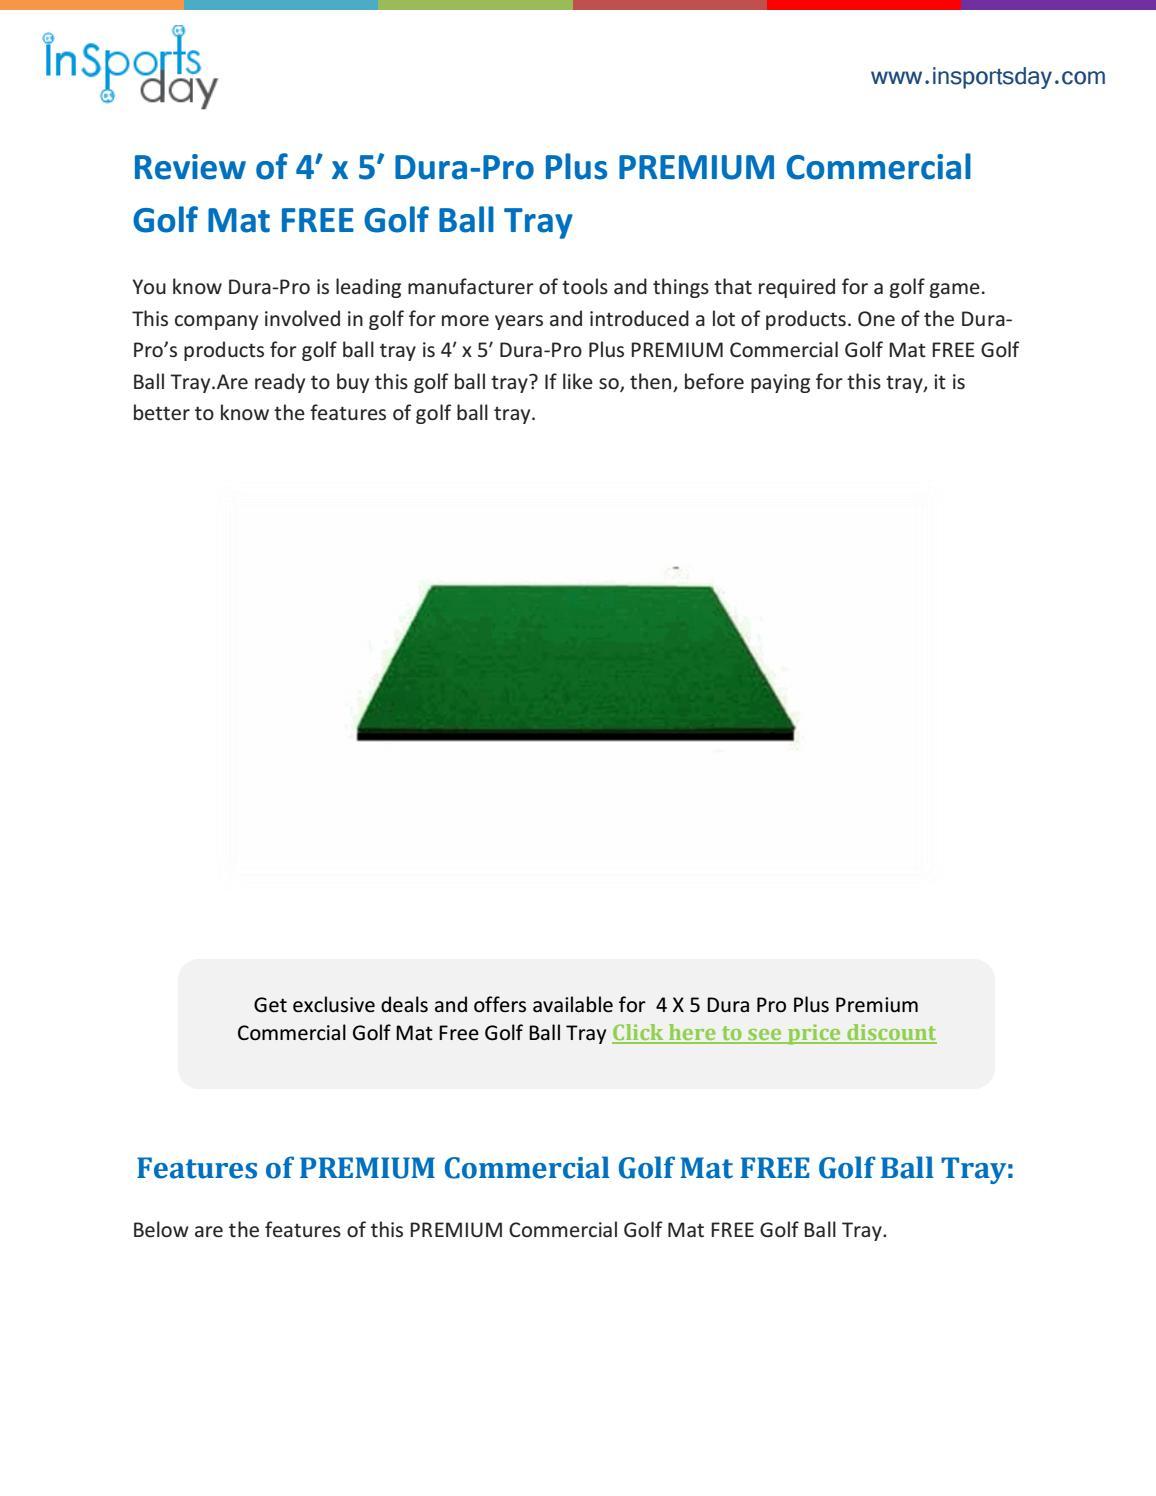 rubber practice dp range mats sports golf net hitting durapro forb ball stance x holder com driving mat world base amazon pro